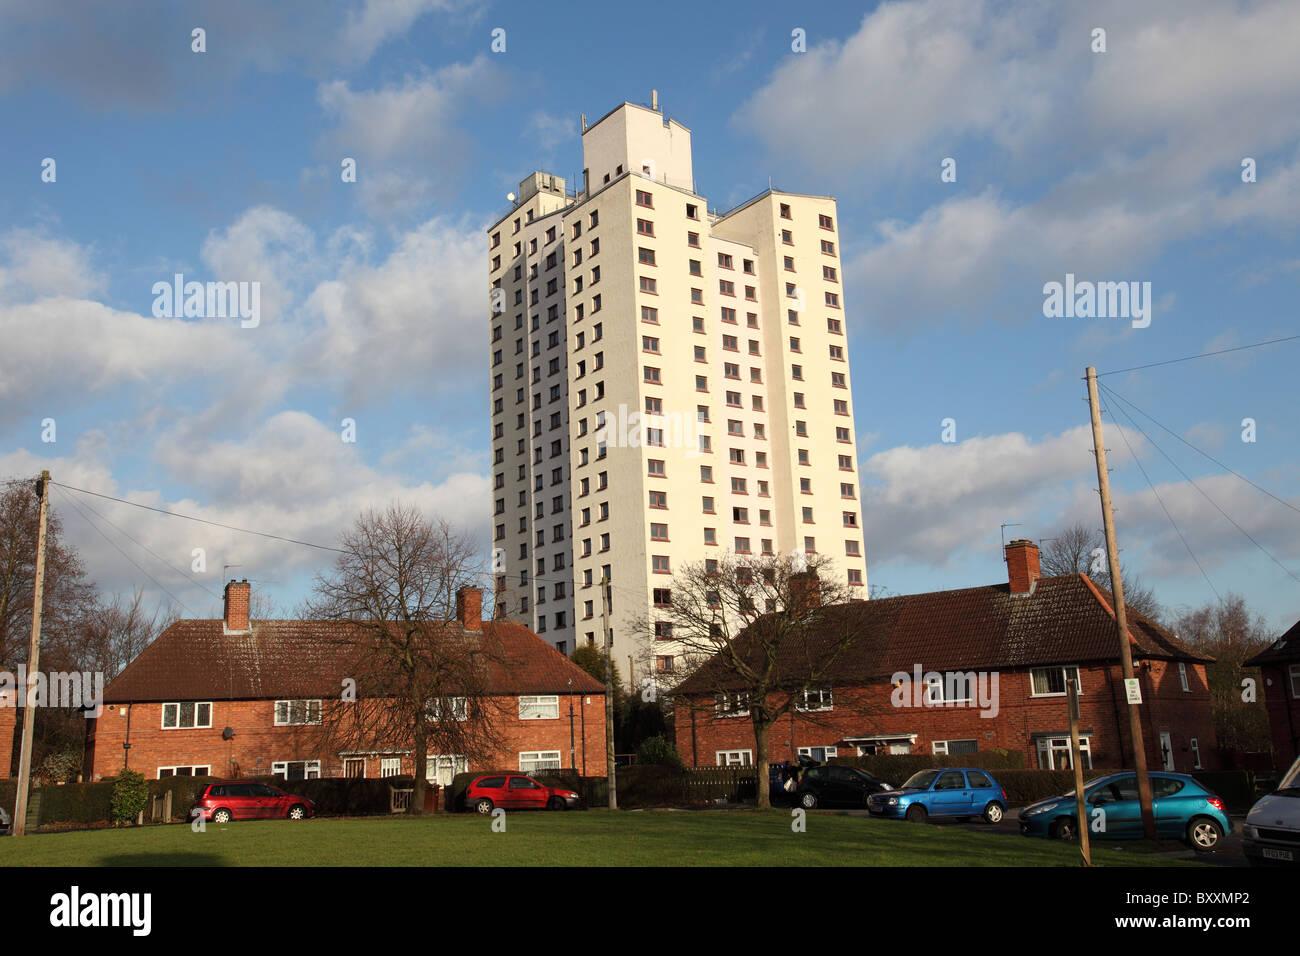 Social housing in Sneinton, Nottingham, England, U.K. - Stock Image